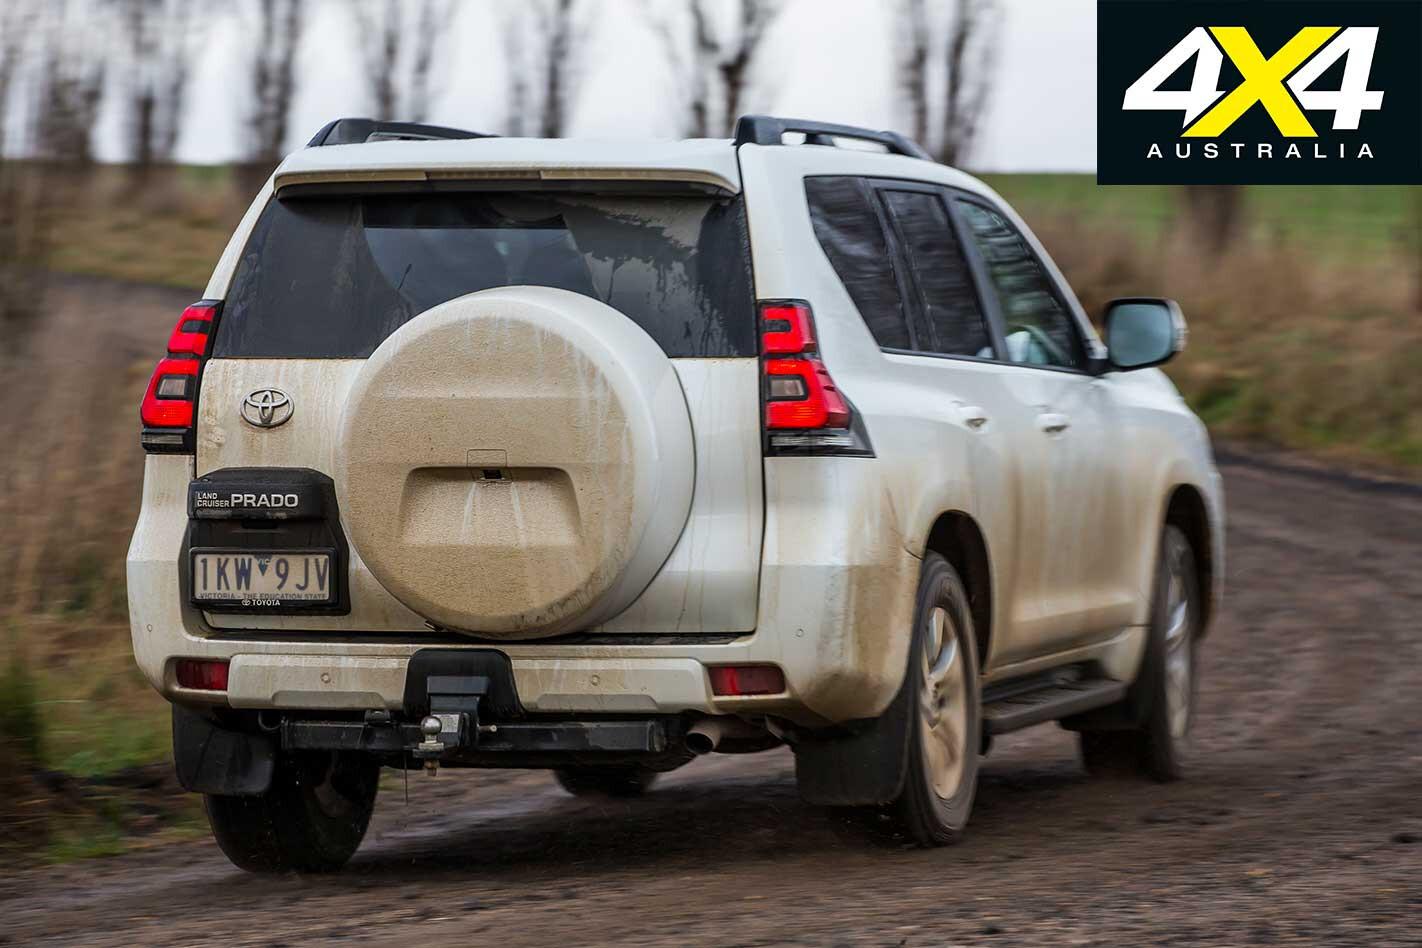 2018 Toyota Prado Handling Rear Jpg